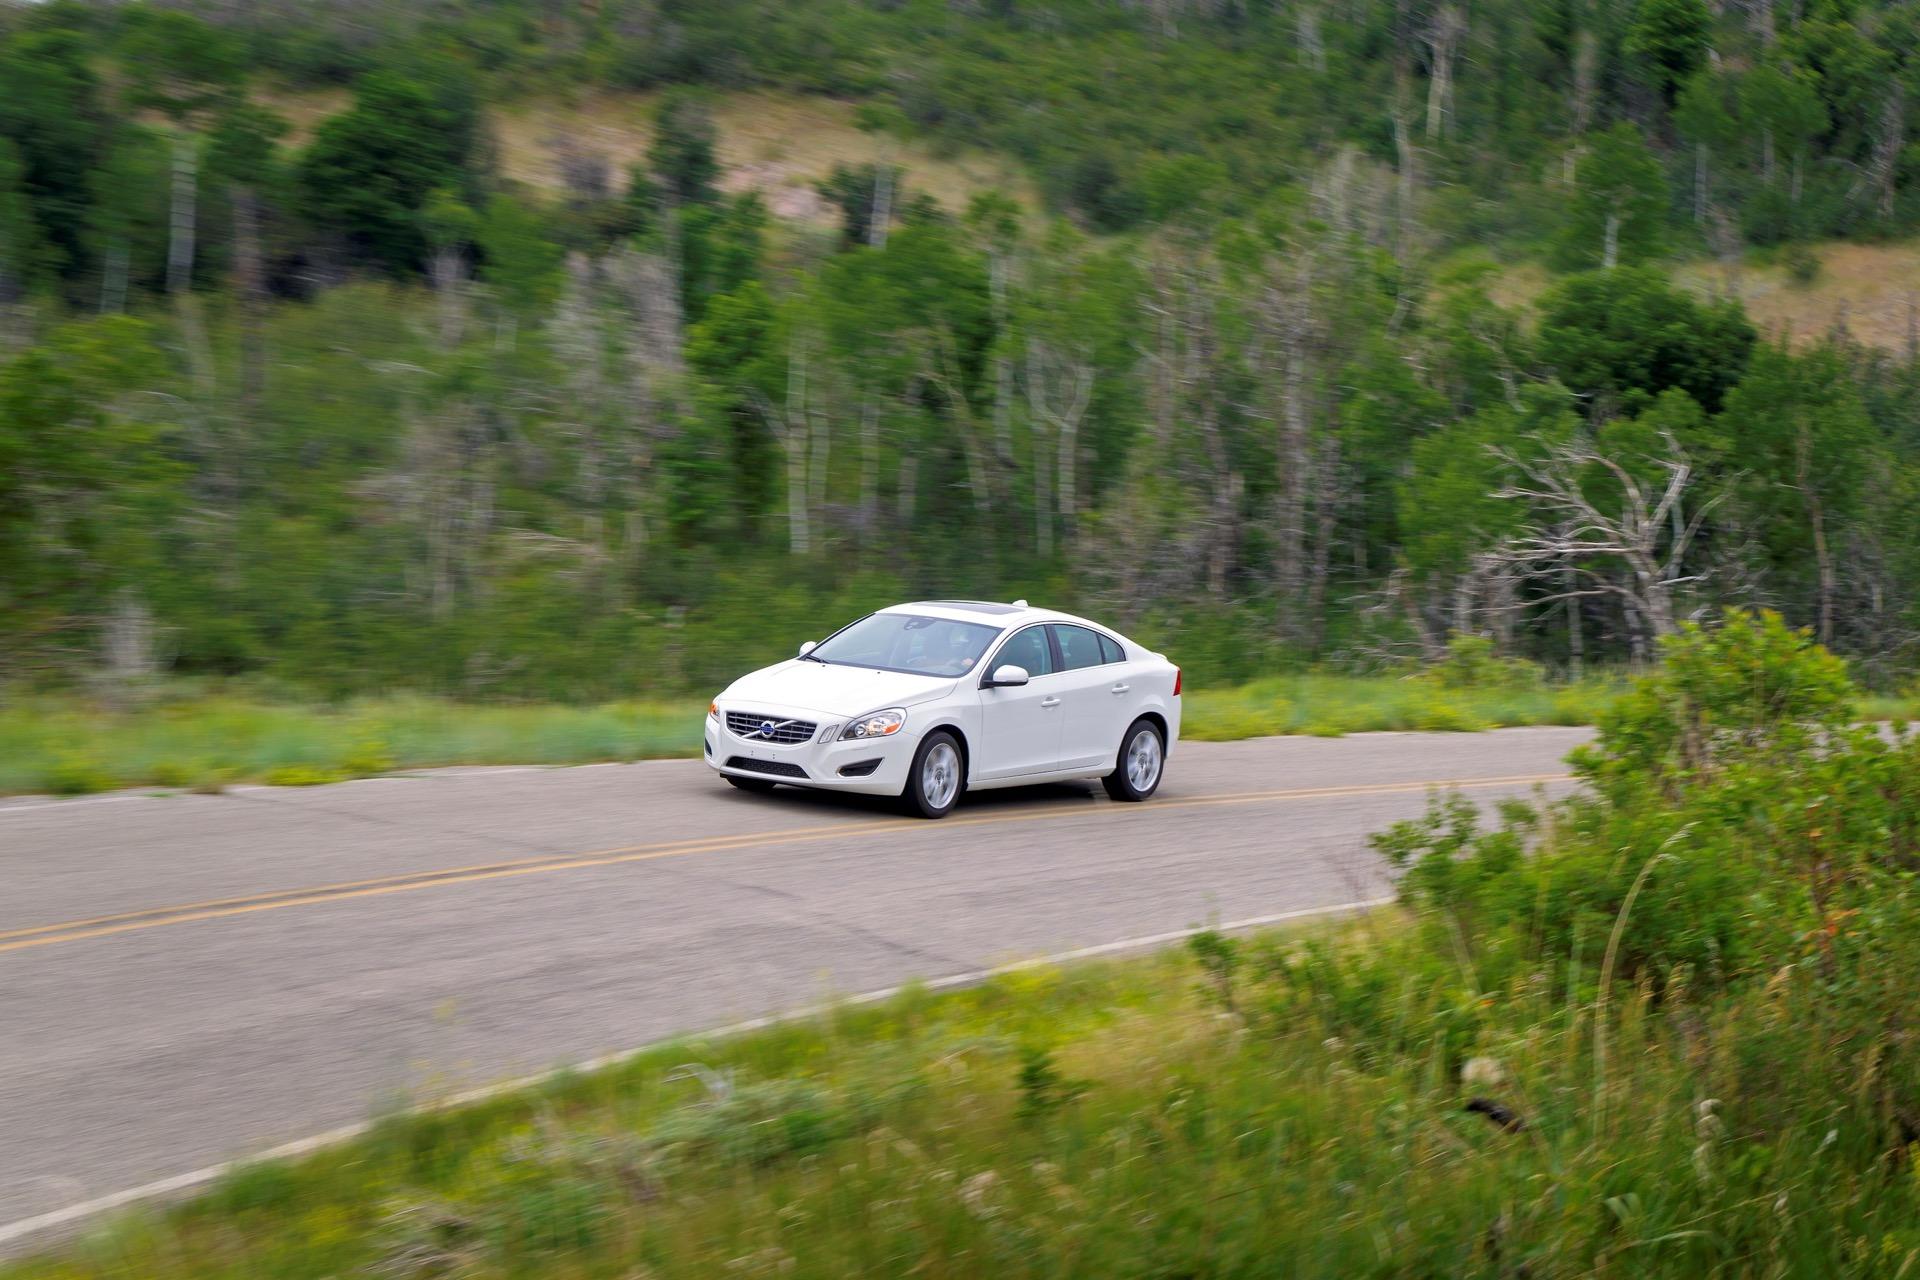 S60 T5 Awd03 -  Volvo